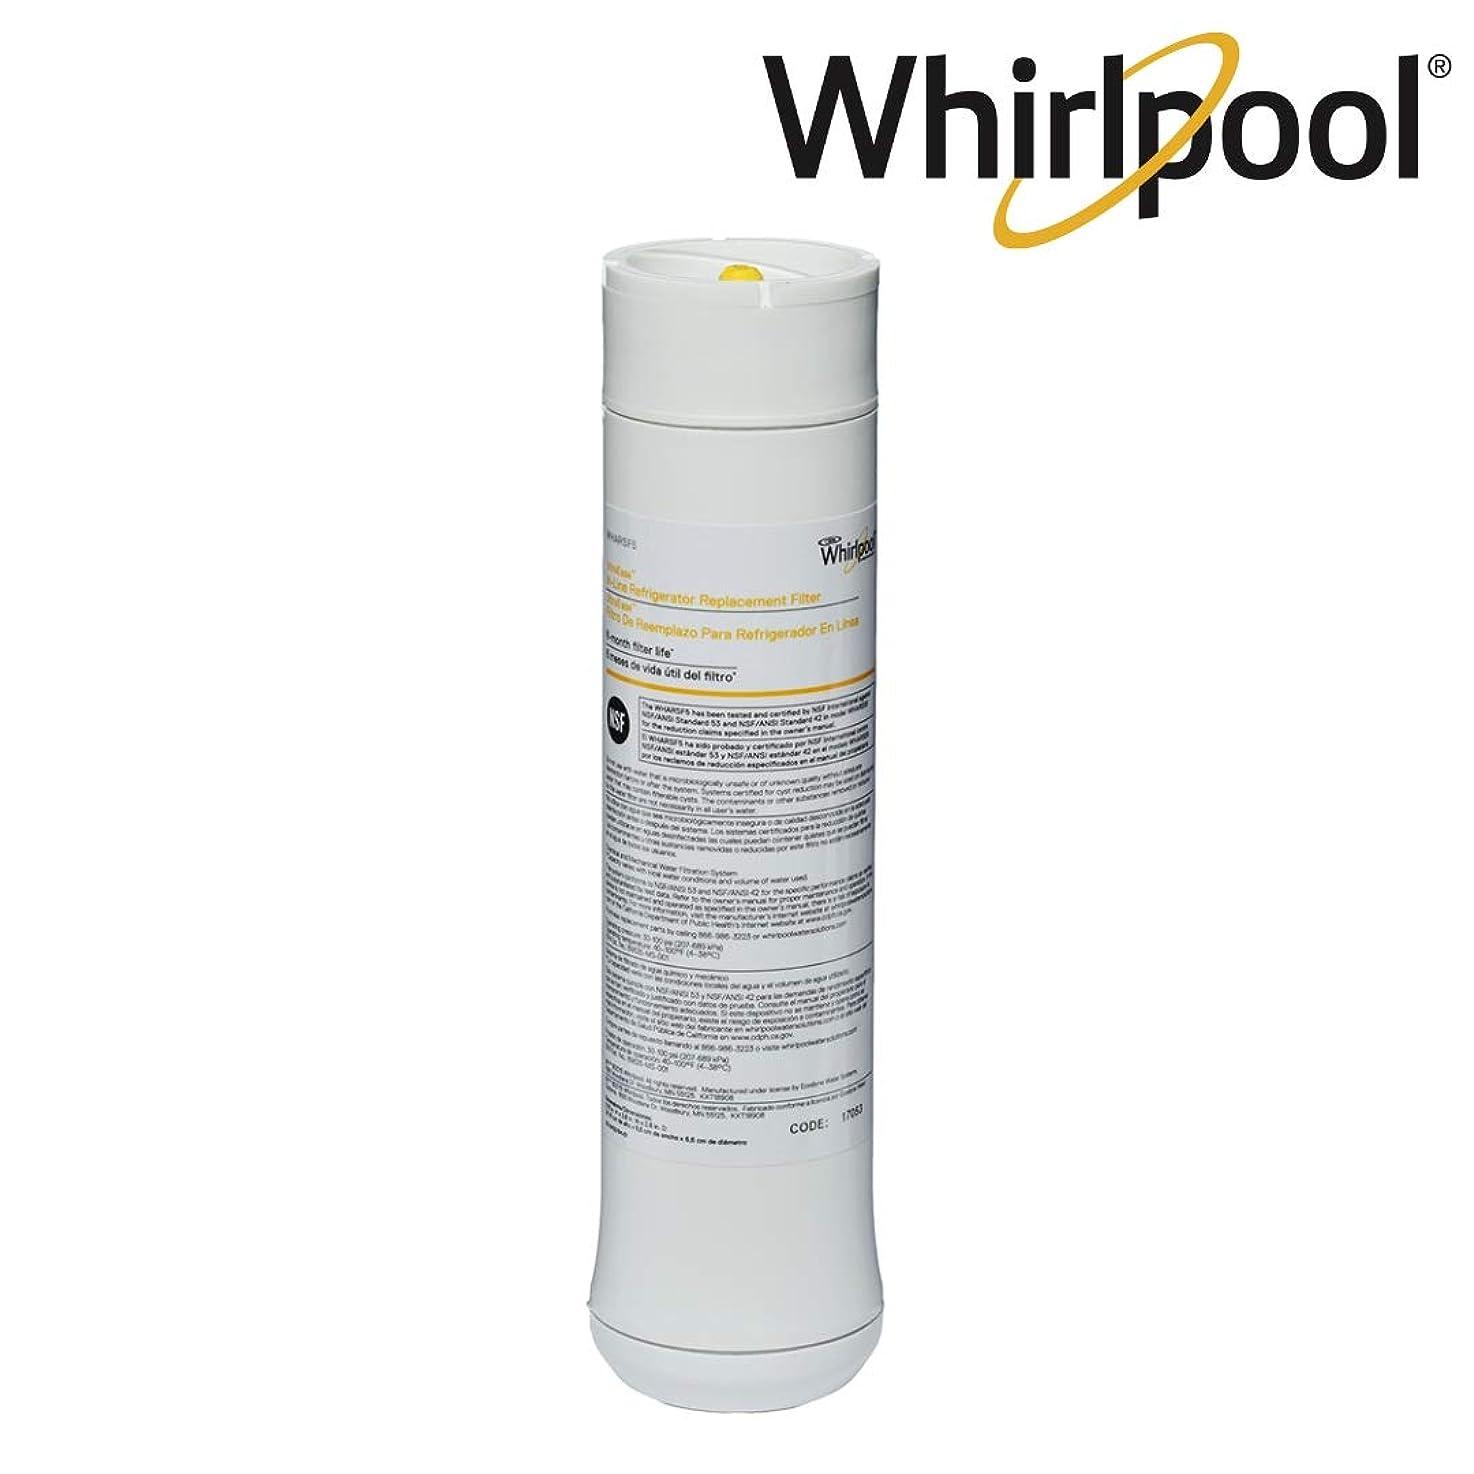 Whirlpool WHARSF5 Water Filter, Bronze